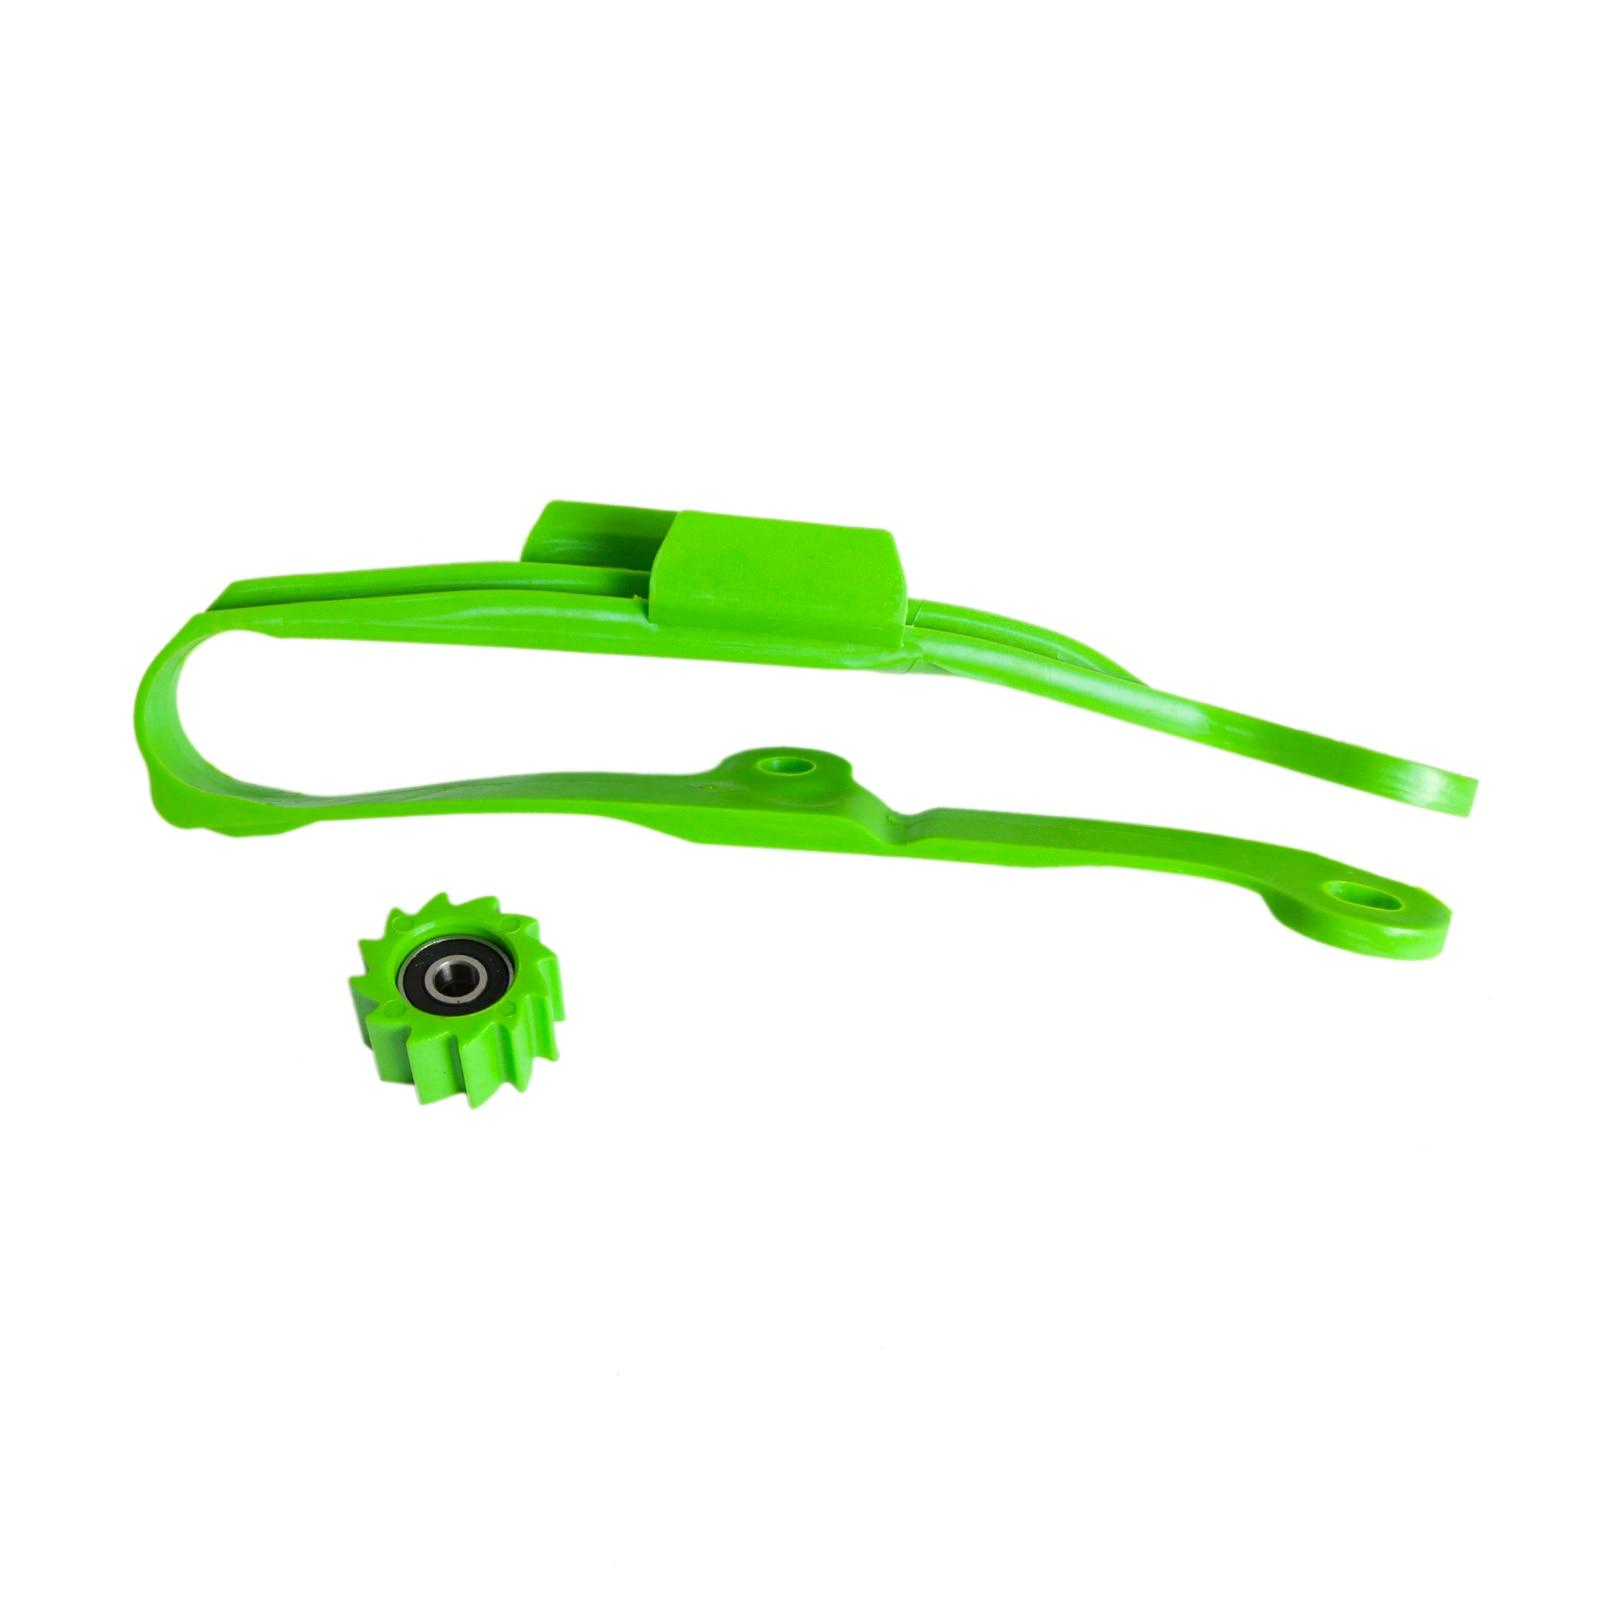 Green Chain Slider With Lower Roller For Kawasaki KX250F 06-16 KX450F 06-15